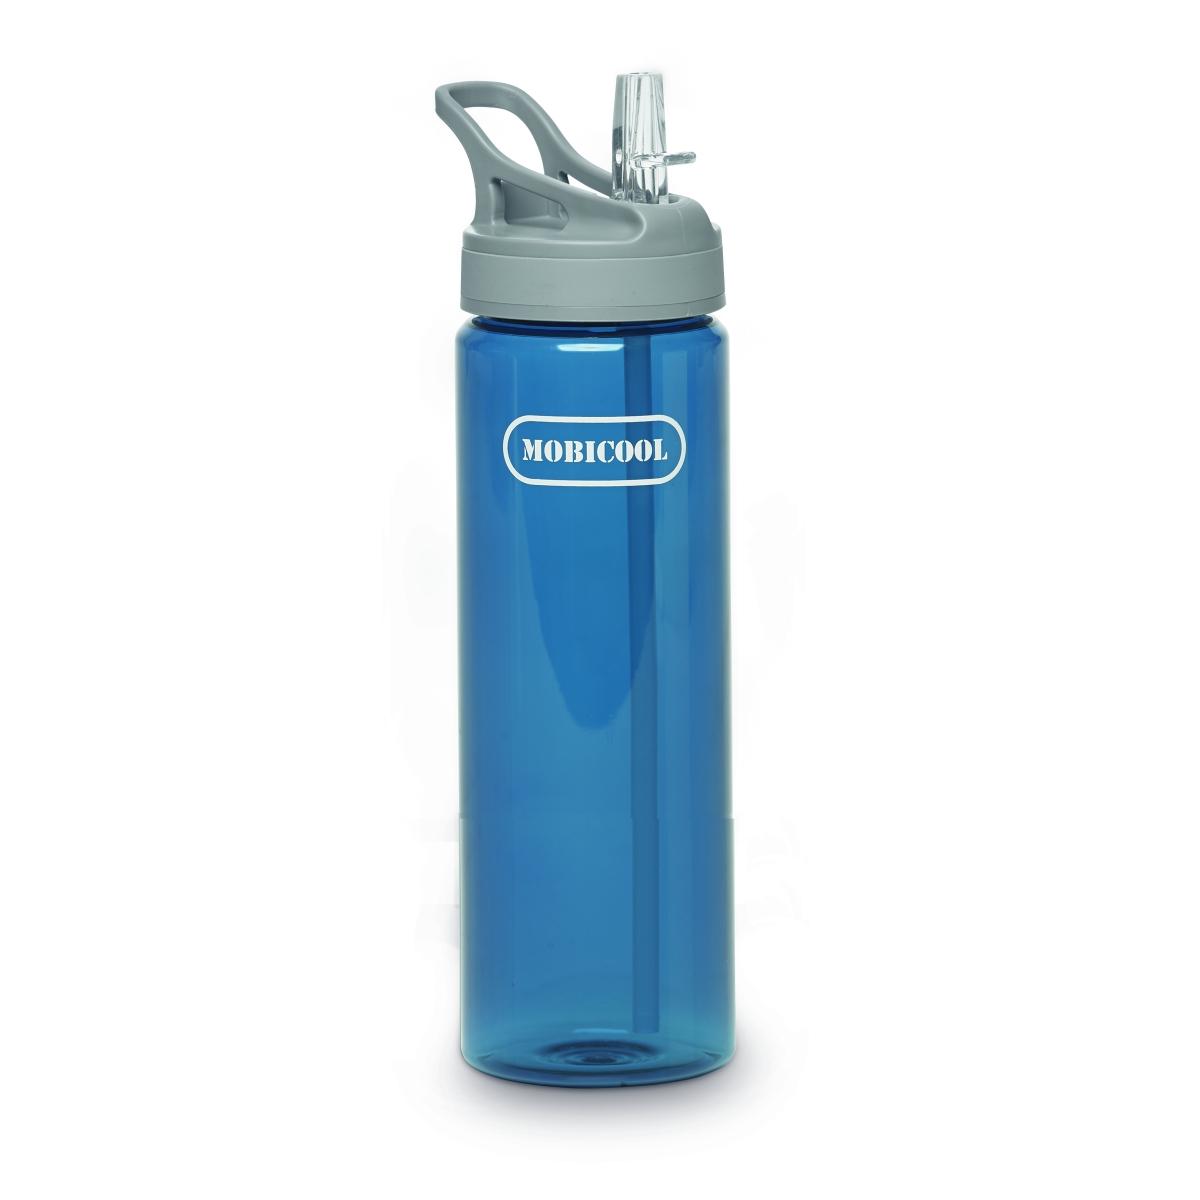 Mobicool Edelstahl-Trinkflasche MDI80 0,8l